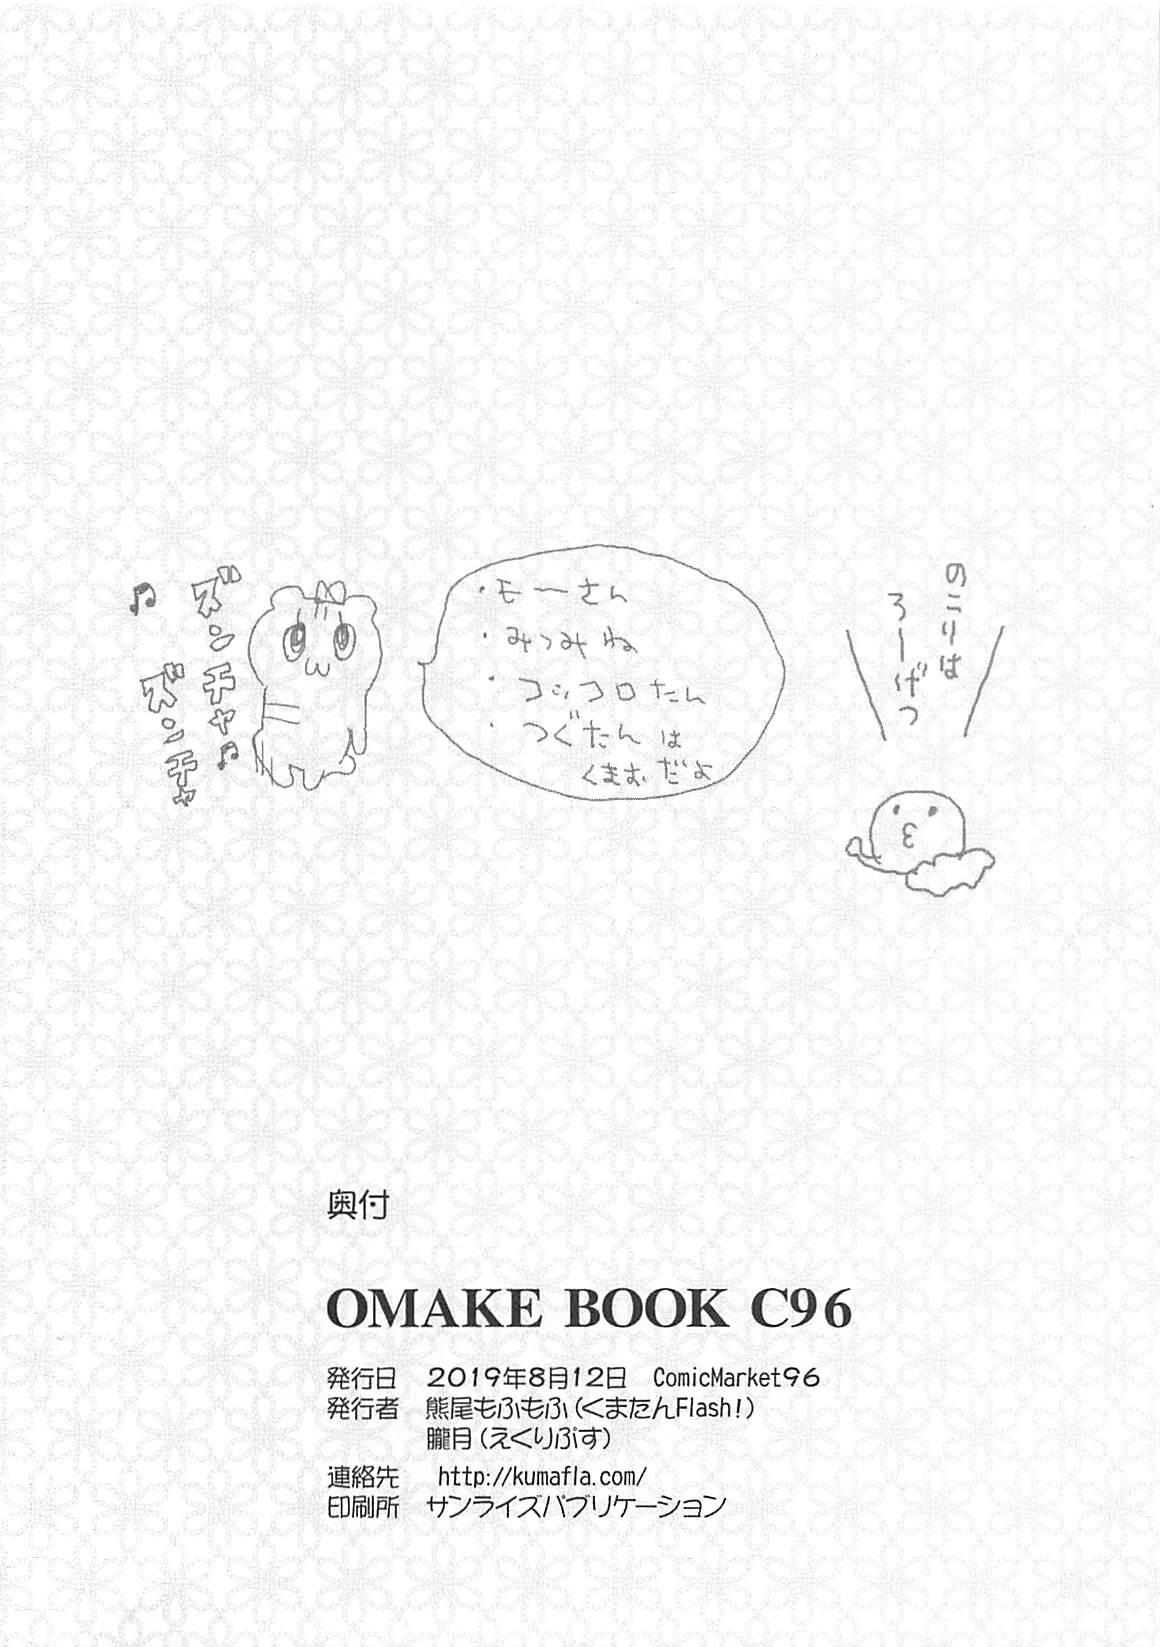 Straylight Porno + OMAKE BOOK C96 32